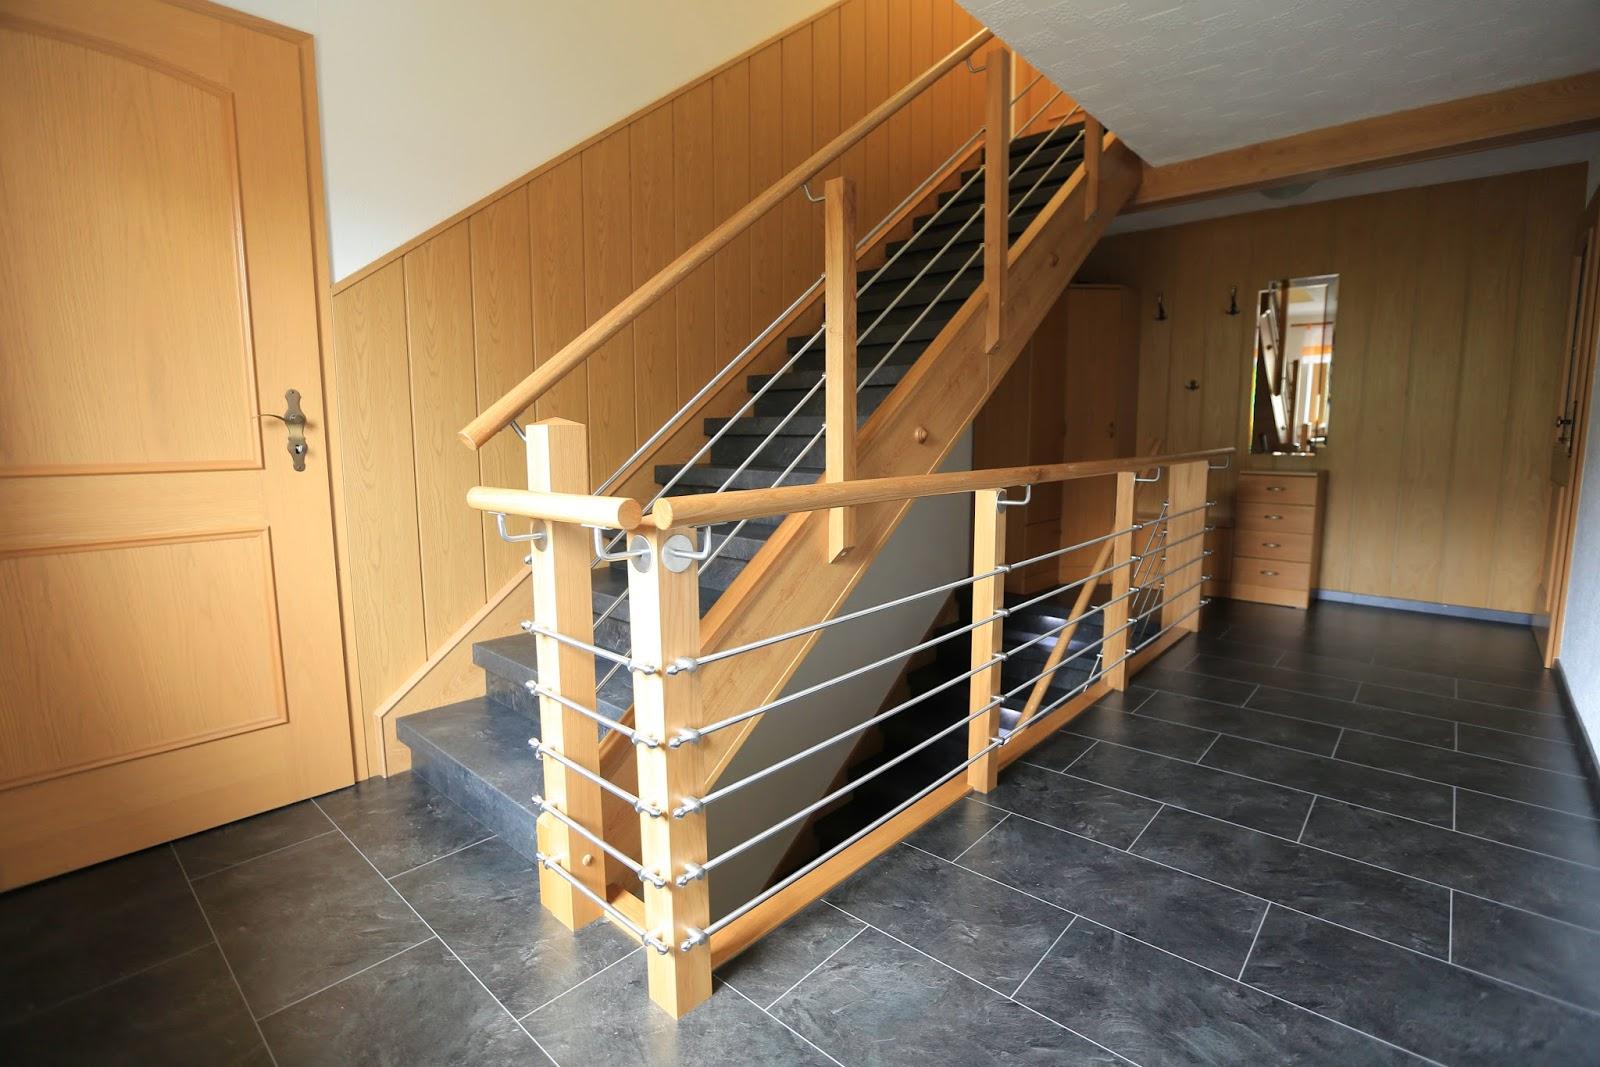 Fabulous H&K Treppenrenovierung: Treppenrenovierung mit einem Holz  LG68